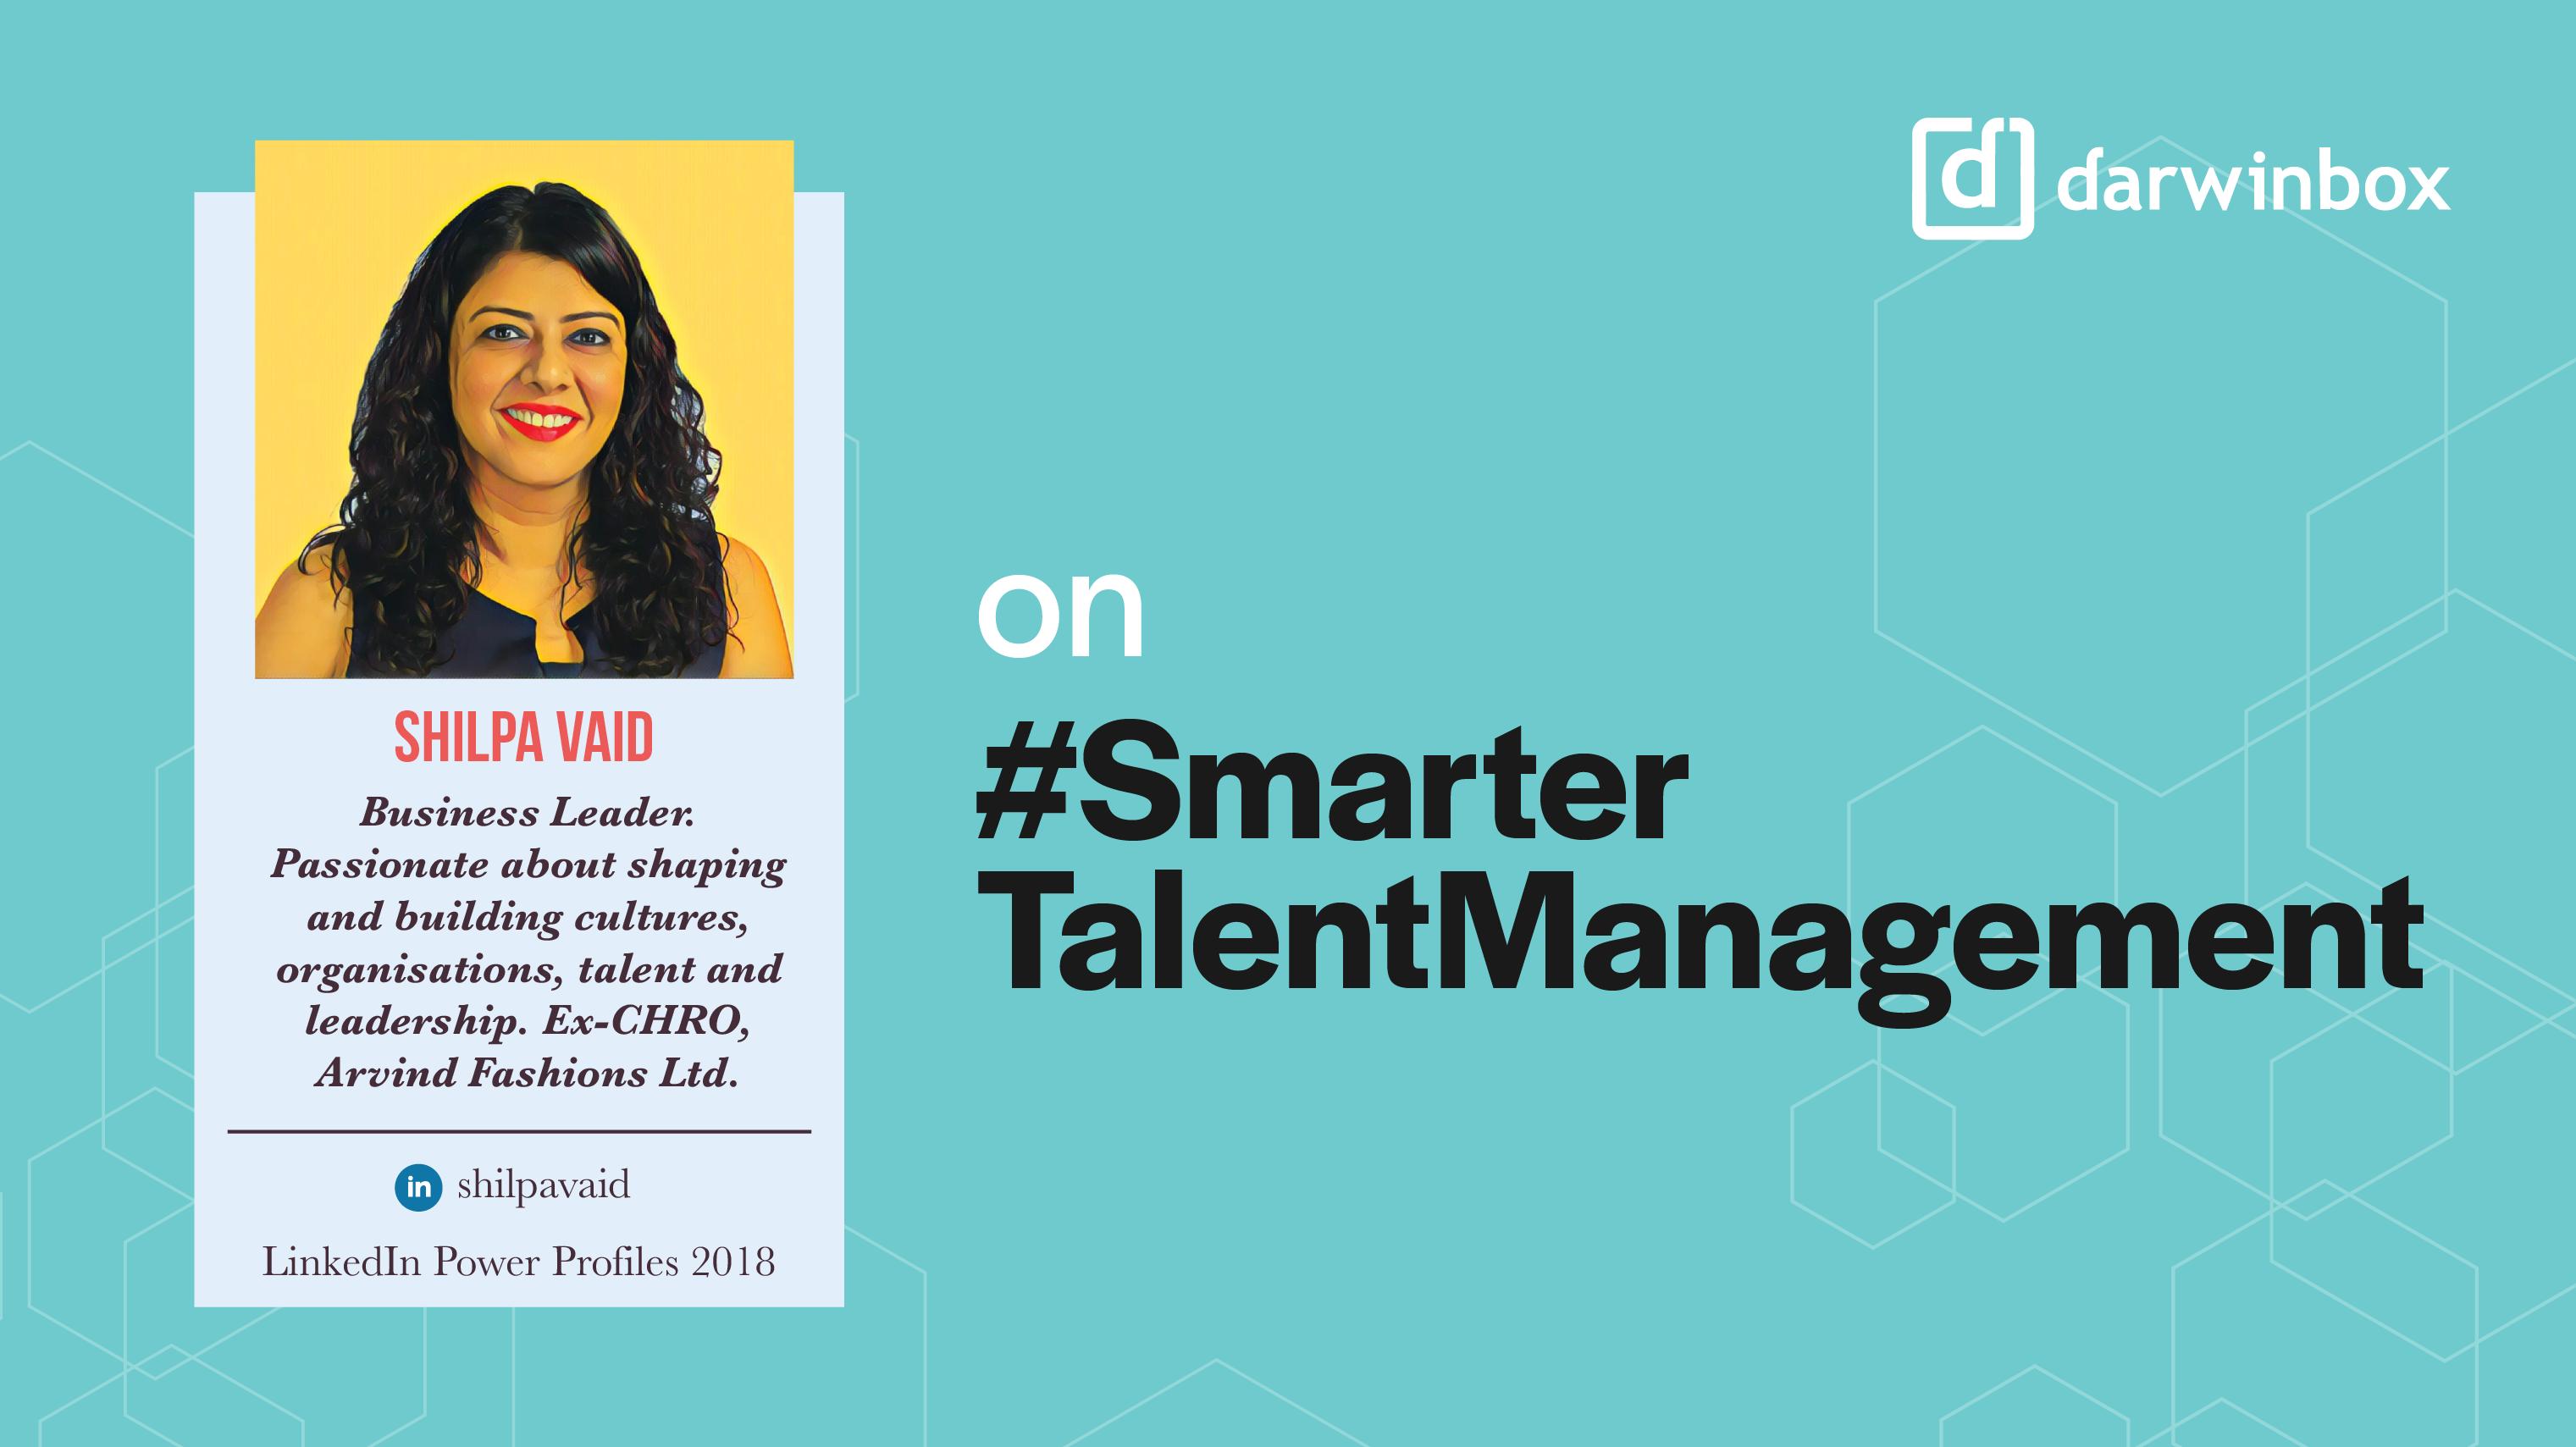 smarter-talent-management